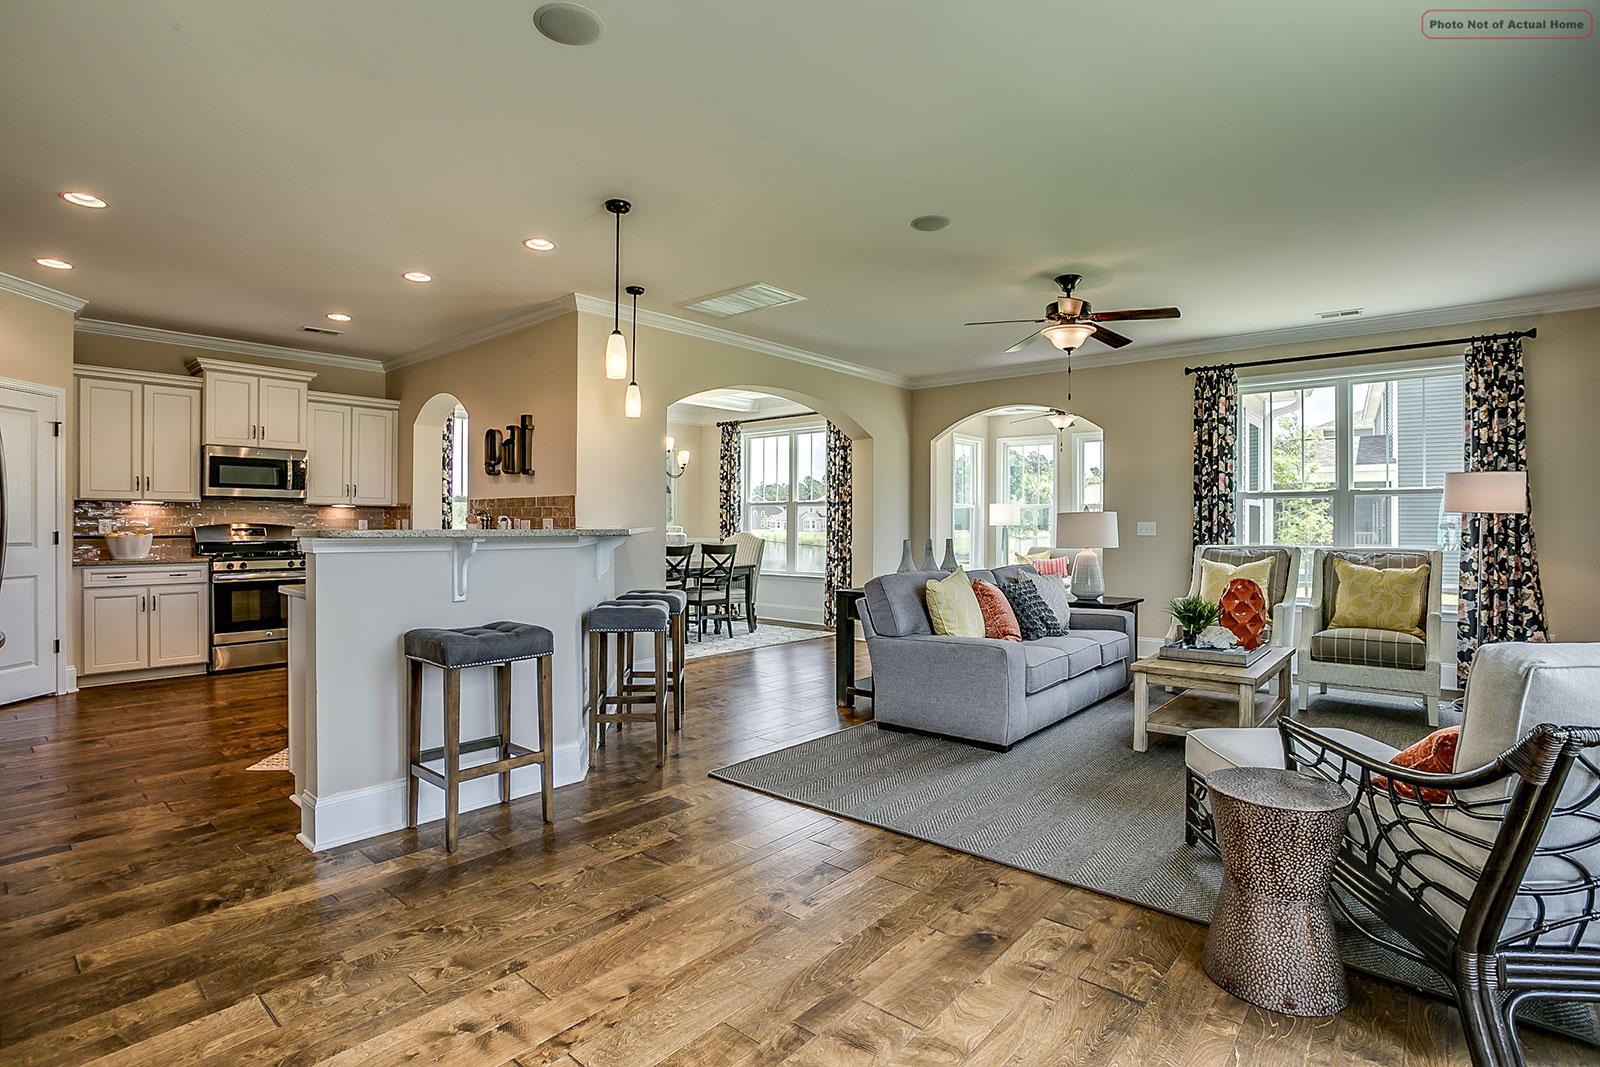 Church Creek Landing Homes For Sale - 2305 Town Woods, Charleston, SC - 7